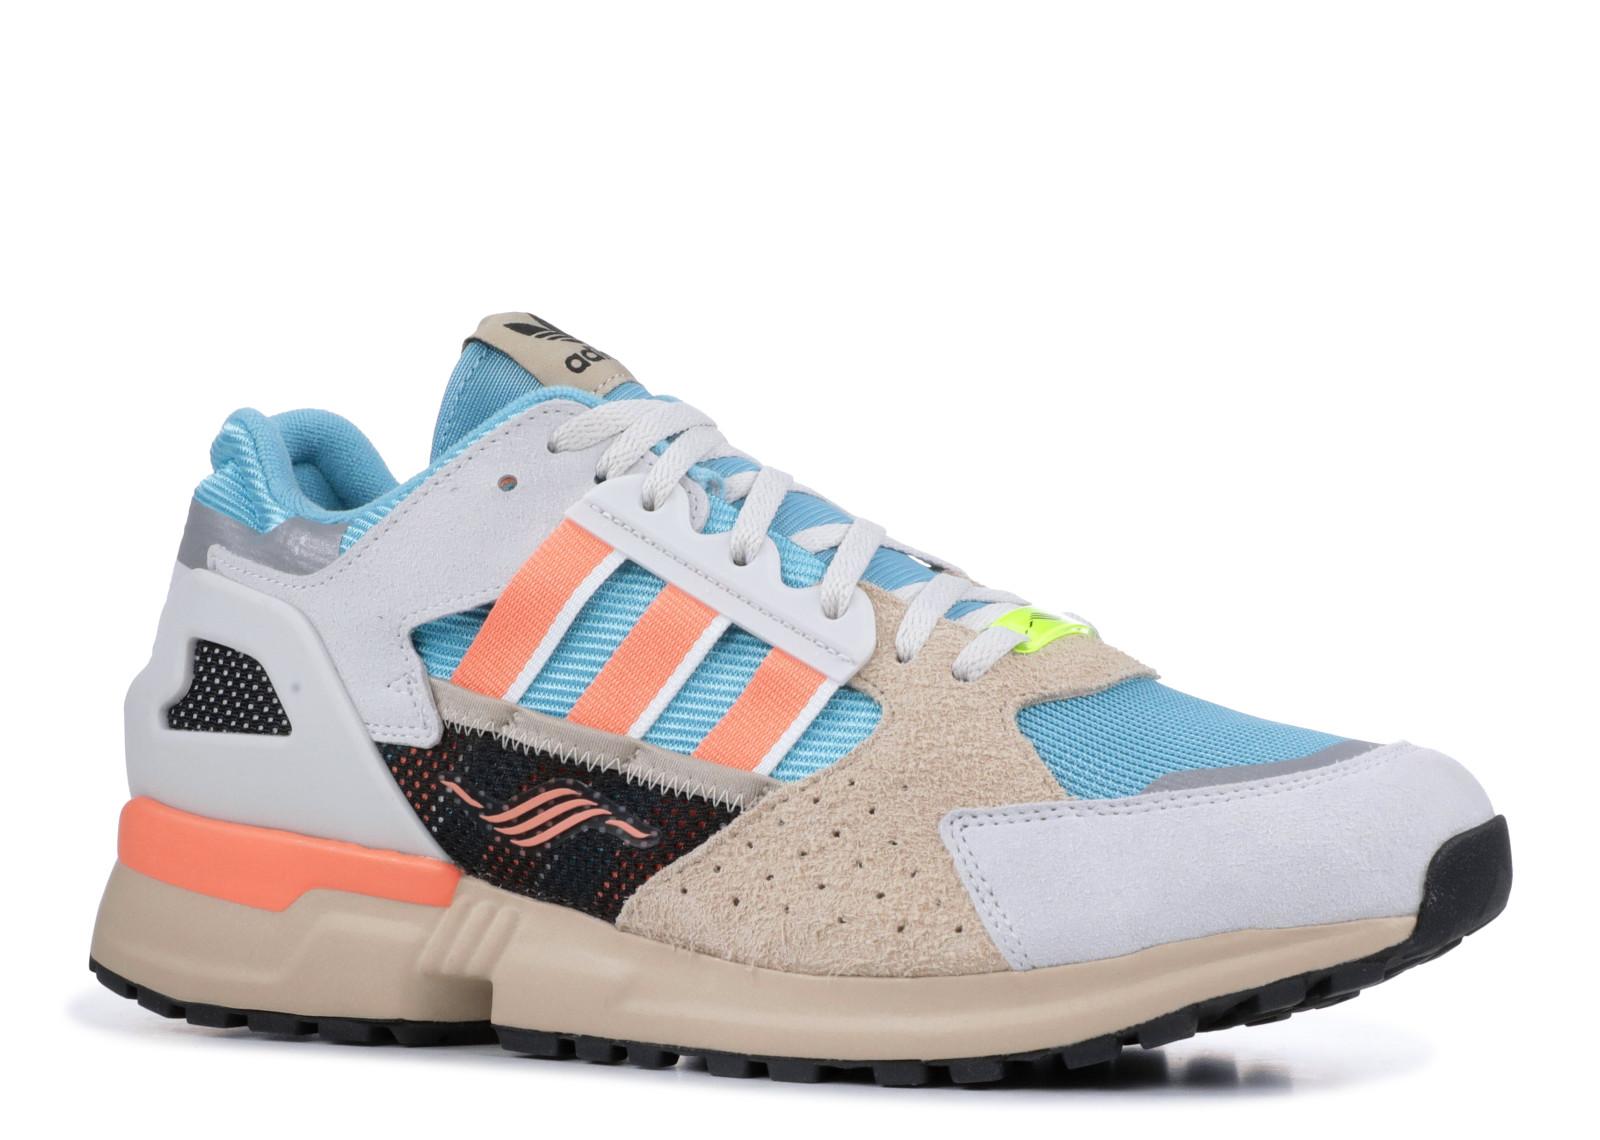 e2e8347b4 Kick Avenue - Authentic Sneakers